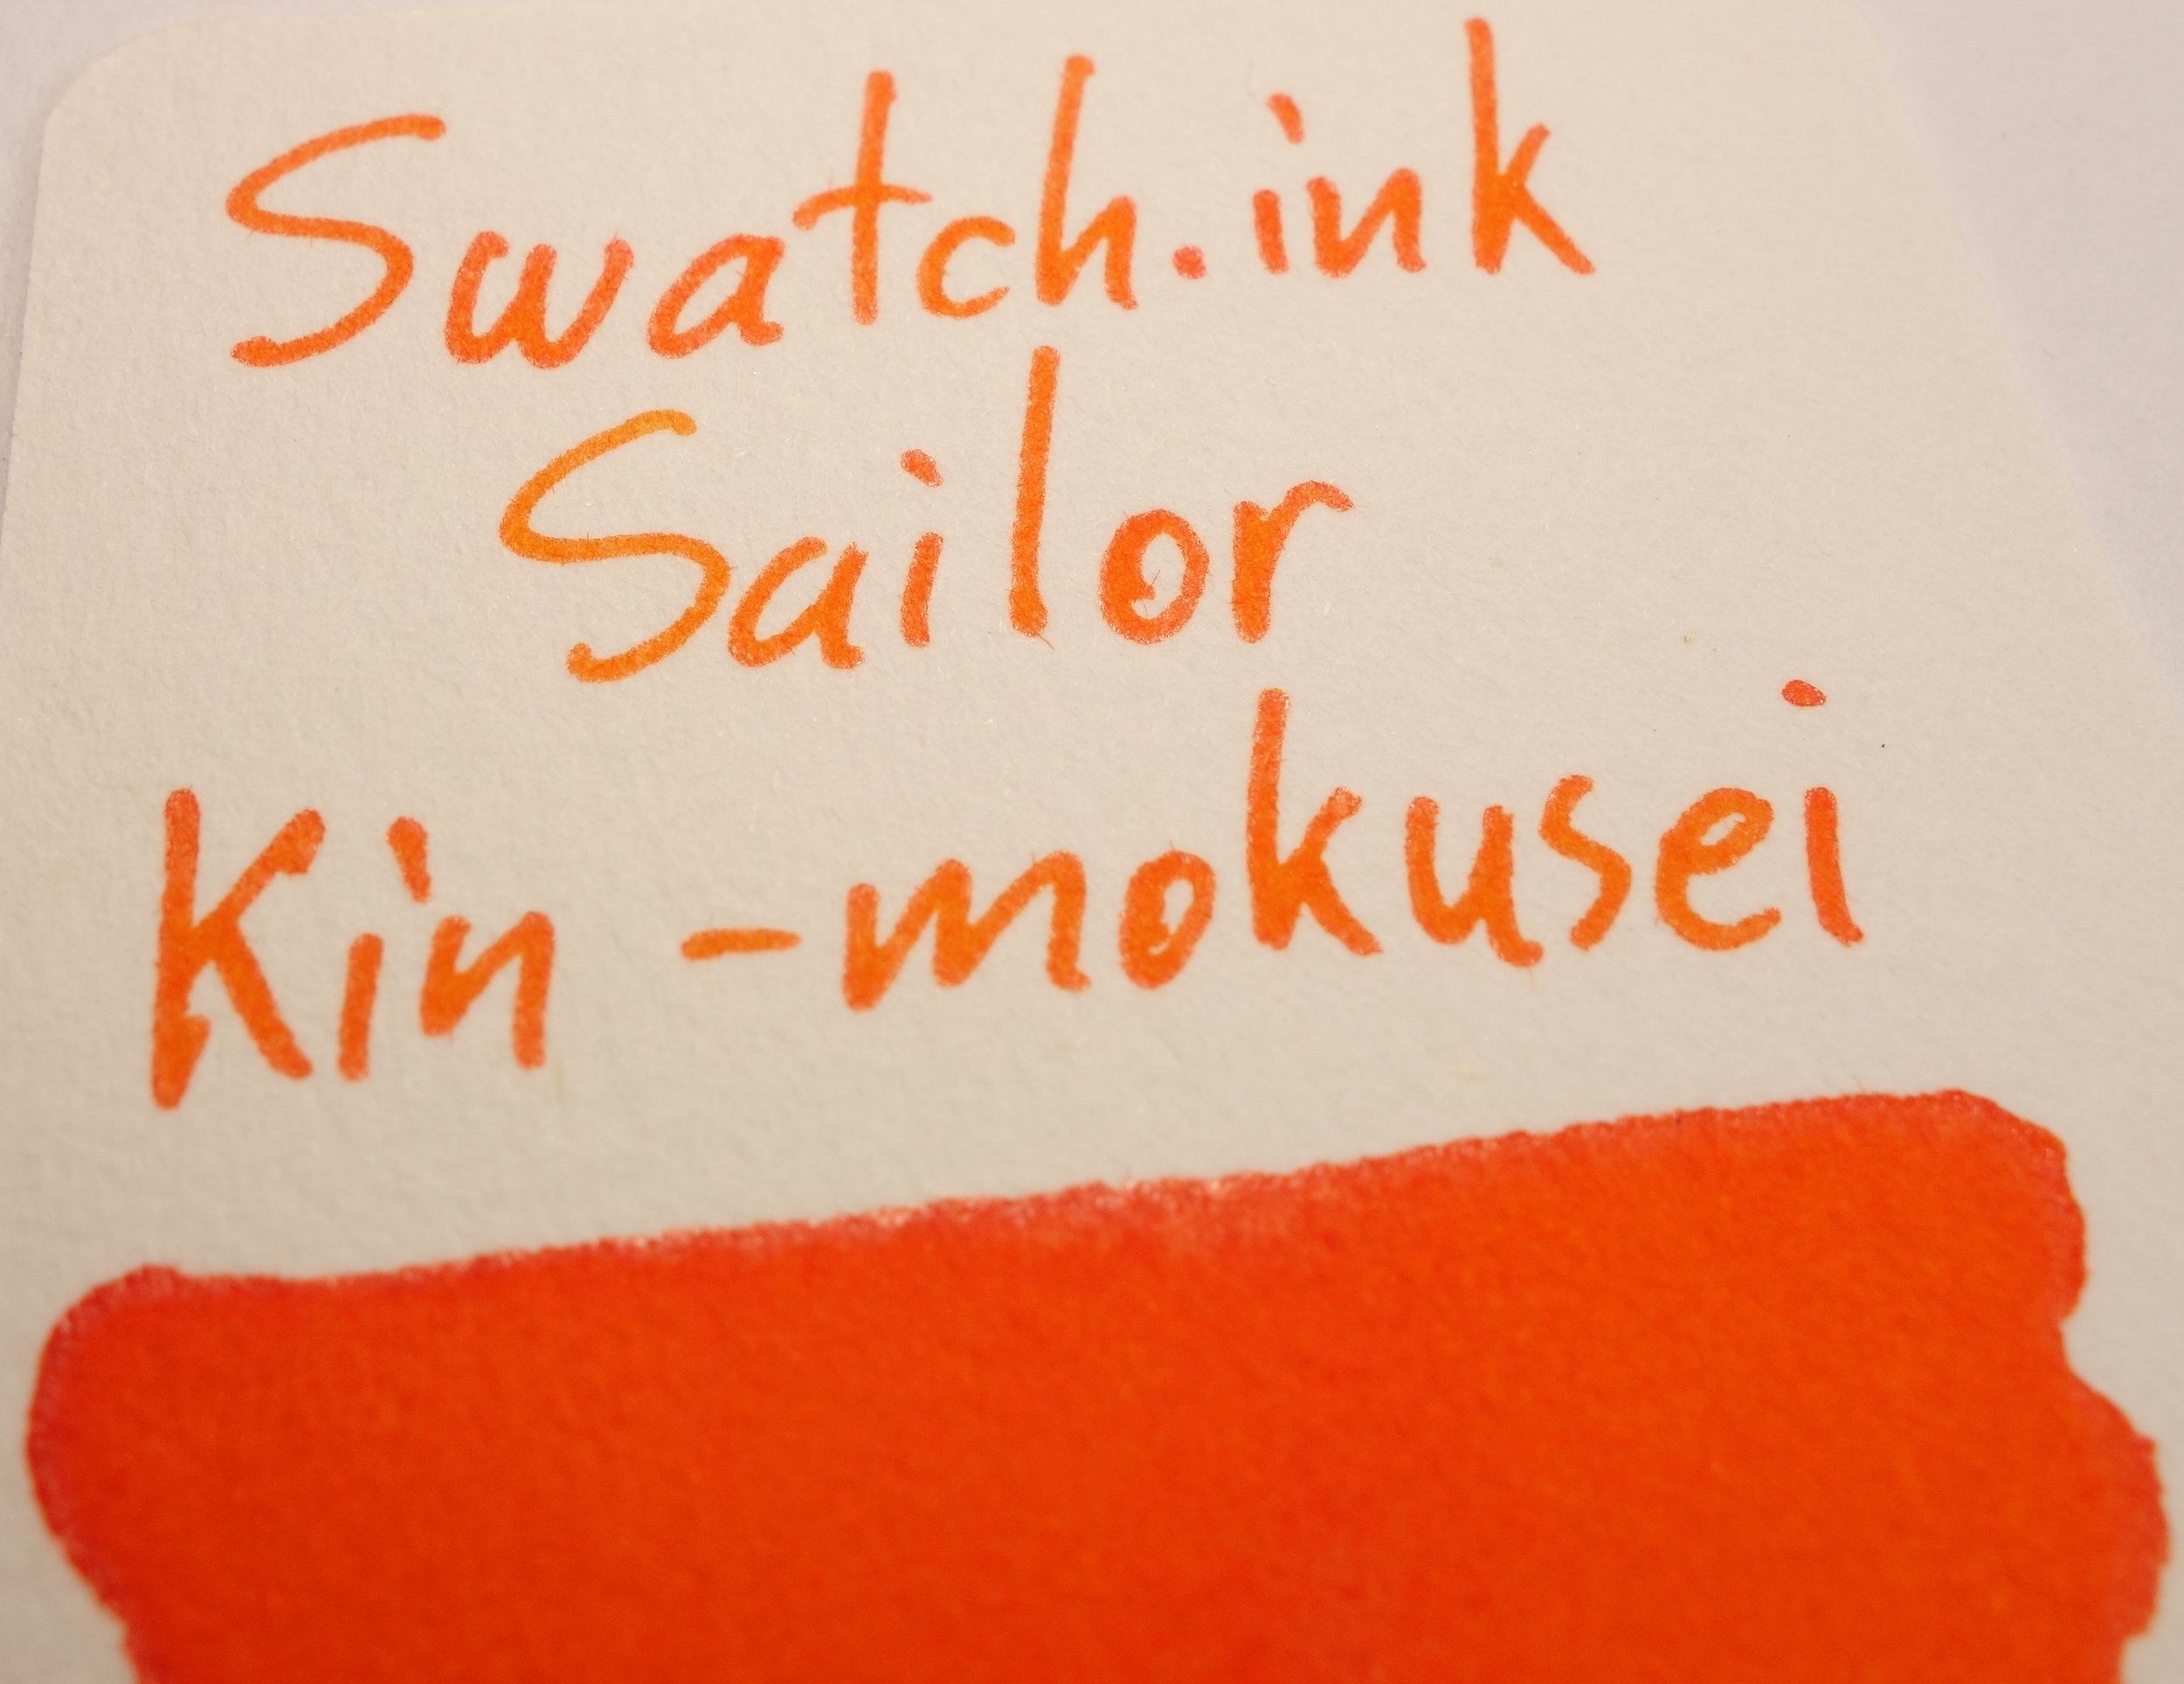 Sailor Kin-mokusei Sheen Swatch.ink.JPG